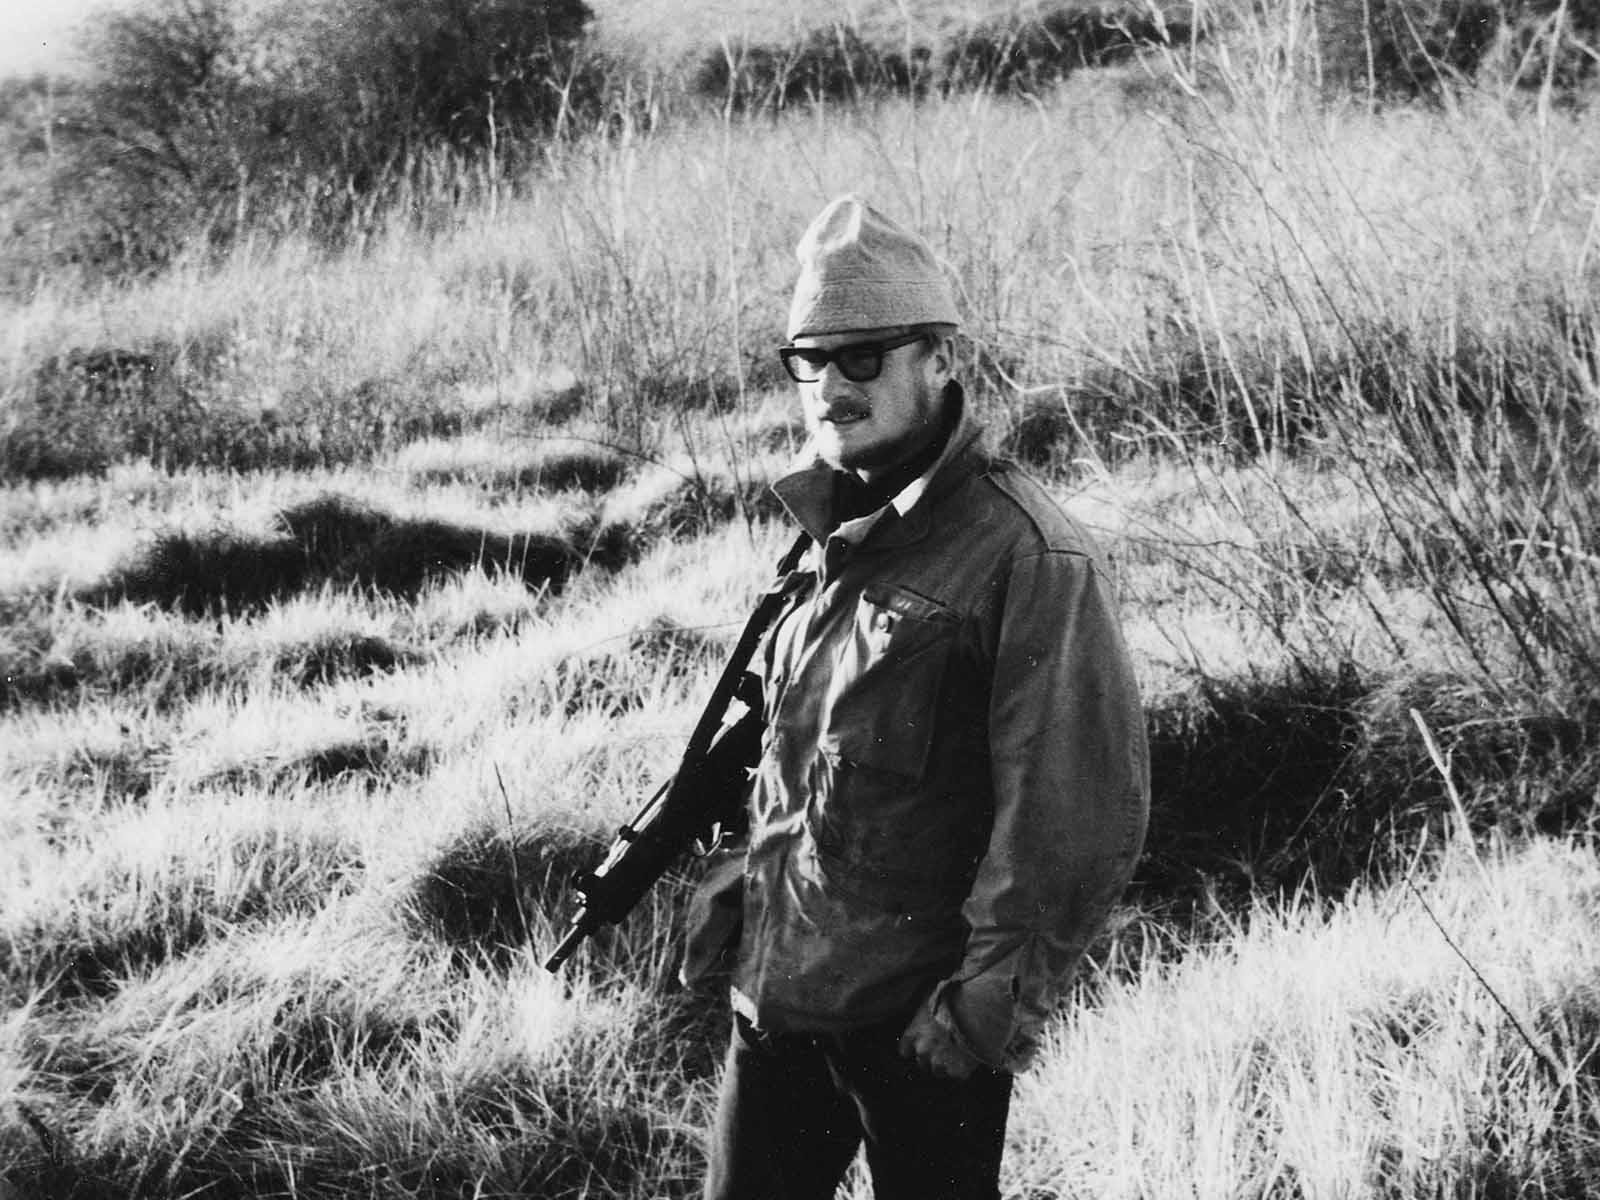 1965: Nach der Matur reiste Peter Näf per Autostopp nach Israel. Hier bewacht er das Kibbuz Hanita an der libanesischen Grenze.